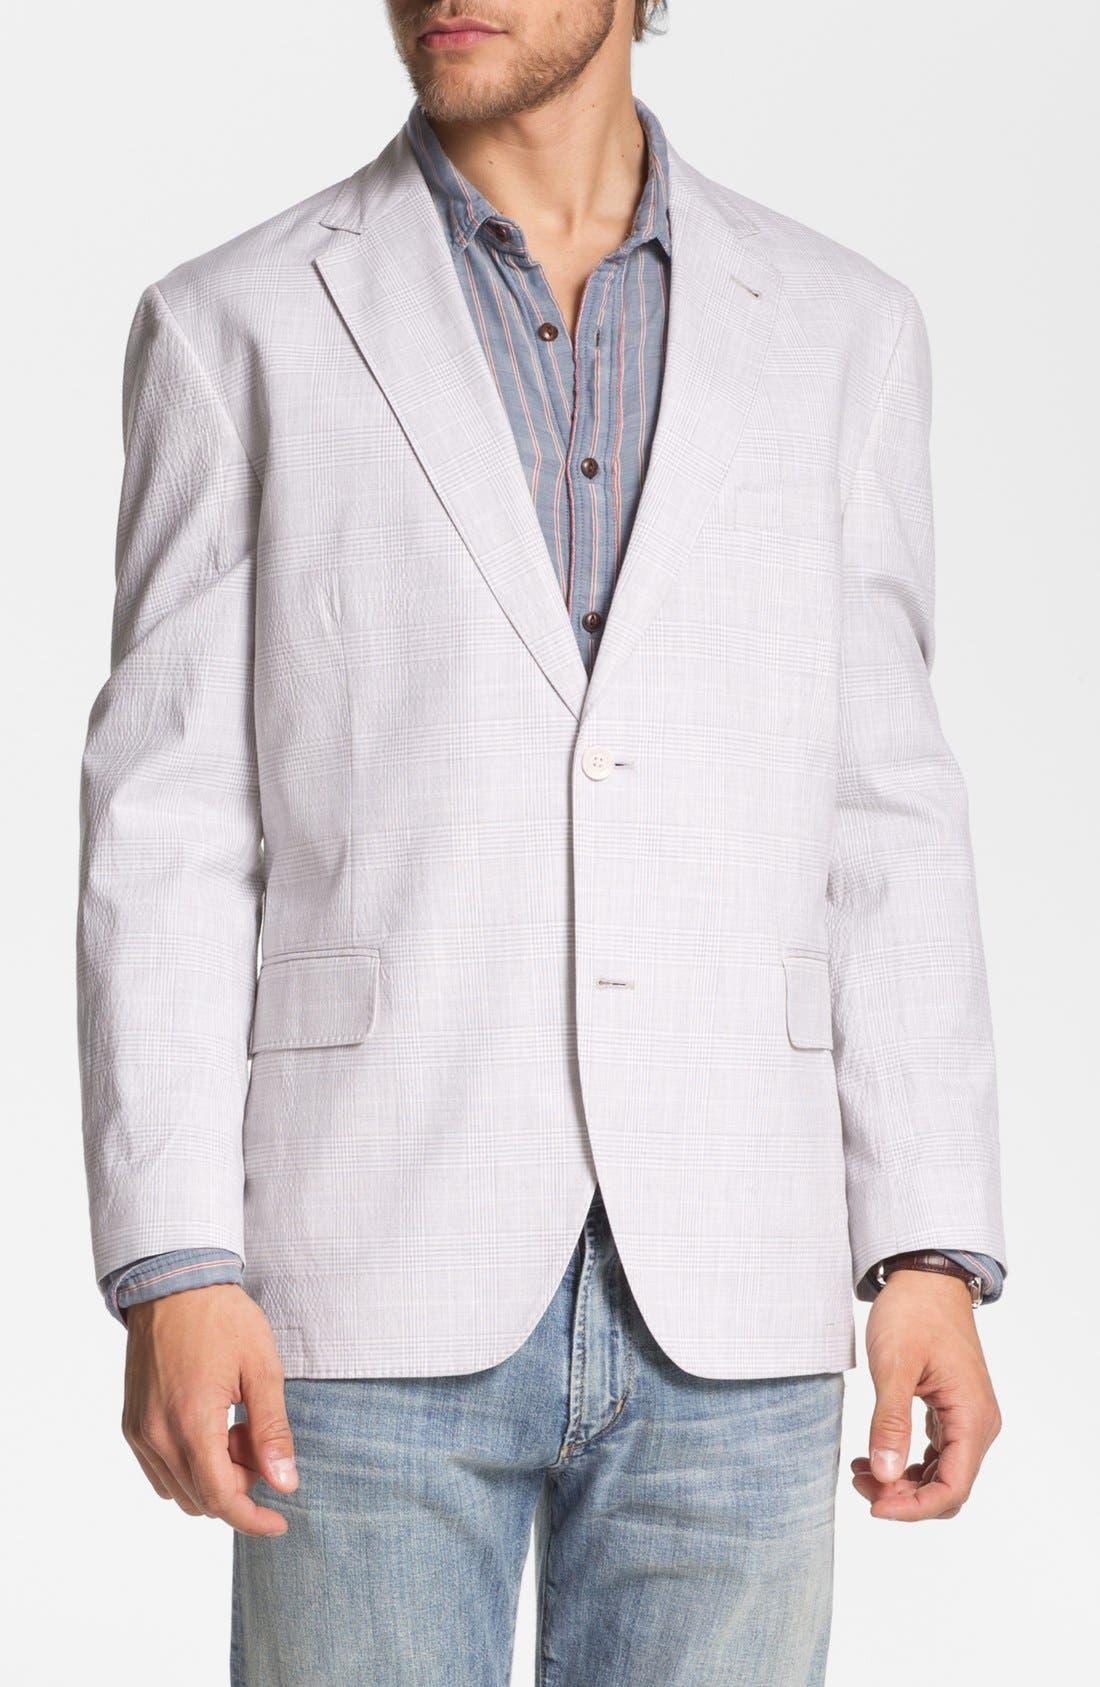 Main Image - Kroon 'Taylor' Sportcoat